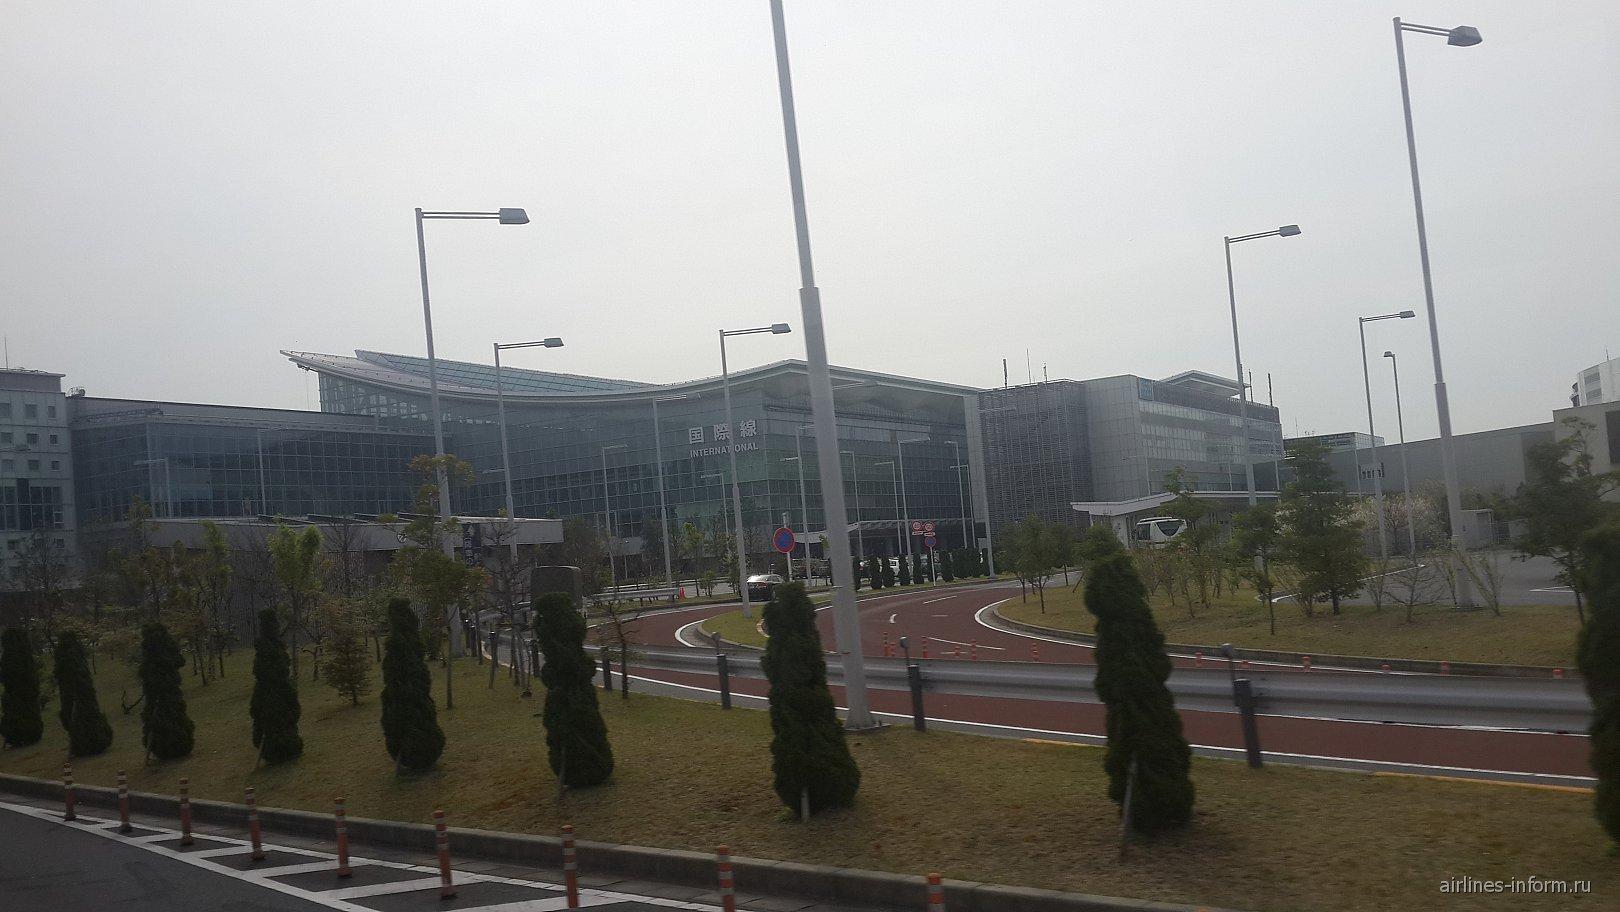 Пассажирский терминал аэропорта Токио Ханеда